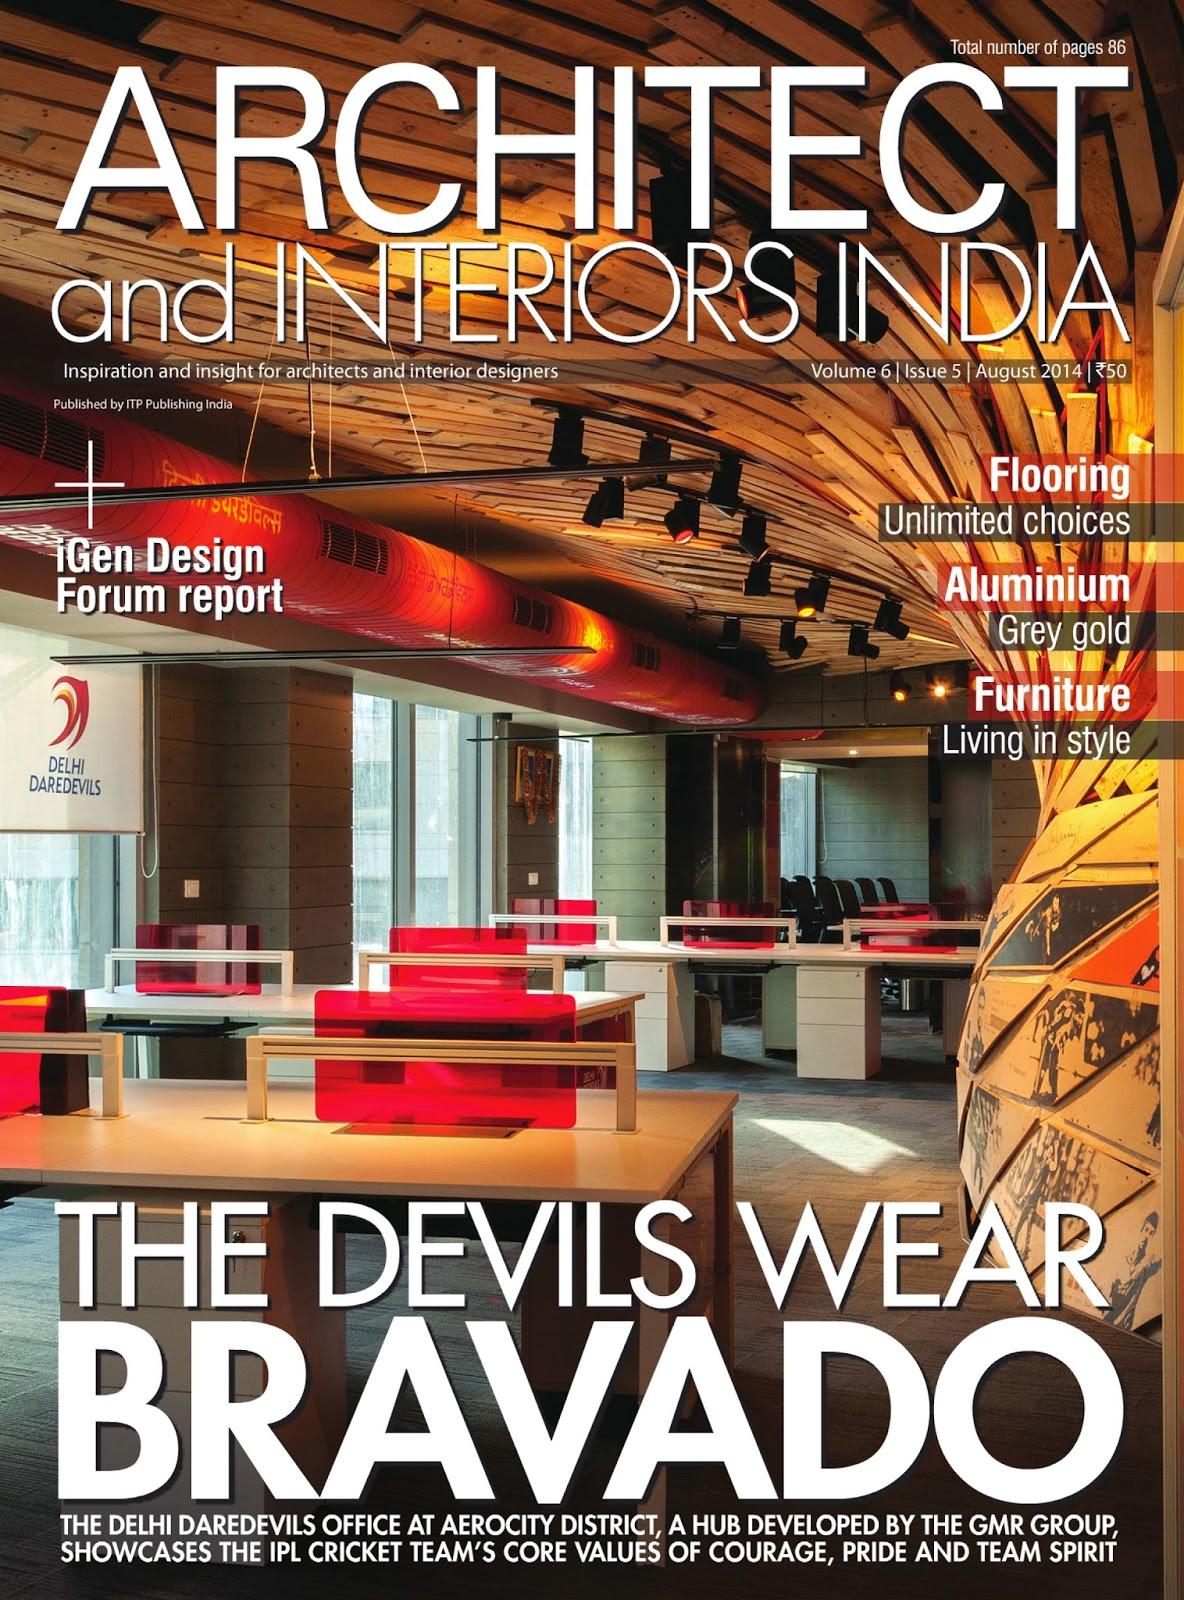 KAYZAD SHROFF For ARCHITECT And INTERIORS INDIA MAGAZINE VOLUME 6 ISSUE 5 AUGUST 2014